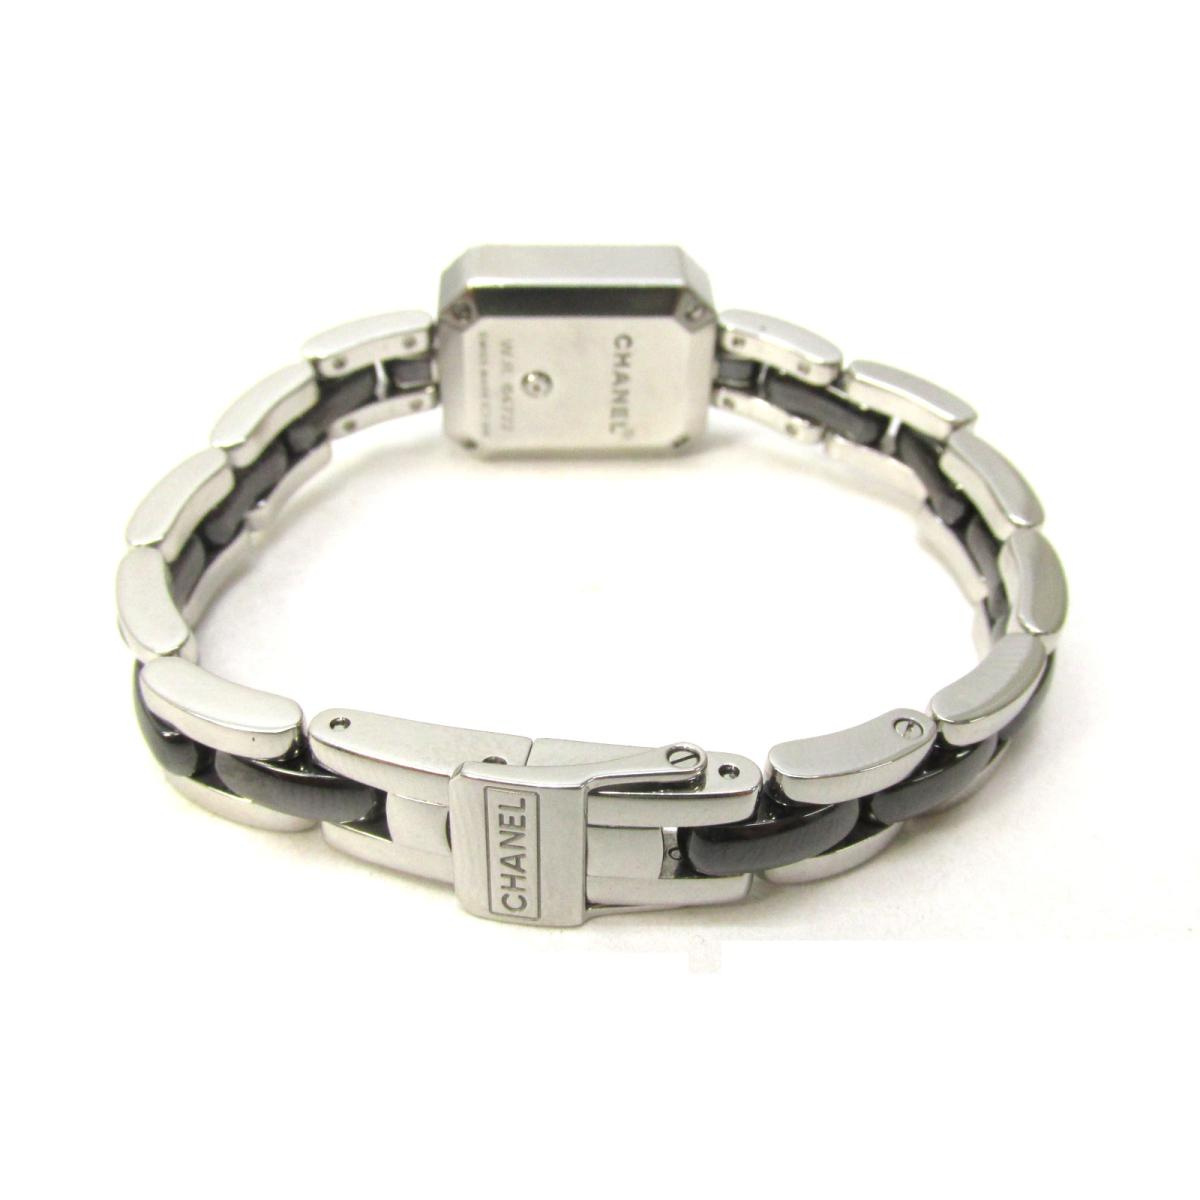 af9809ec Auth CHANEL Premiere Diamond Bezel Wrist Watch H2163 Black SS/Ceramic For  Ladies | BRANDOFF Ginza/TOKYO/Japan